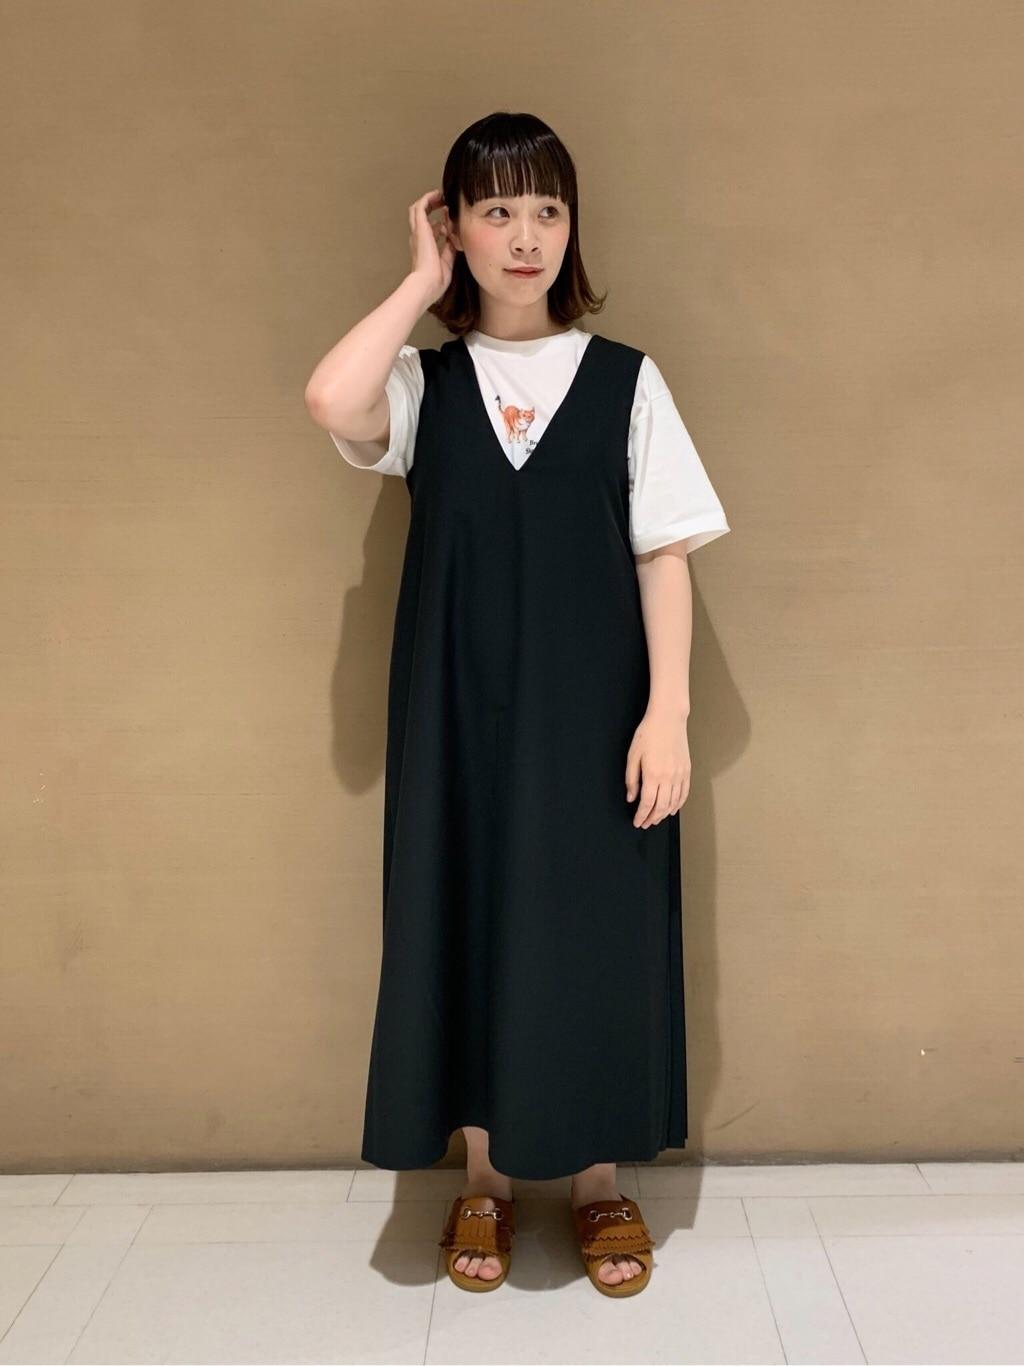 l'atelier du savon 広島パルコ 身長:157cm 2019.07.08